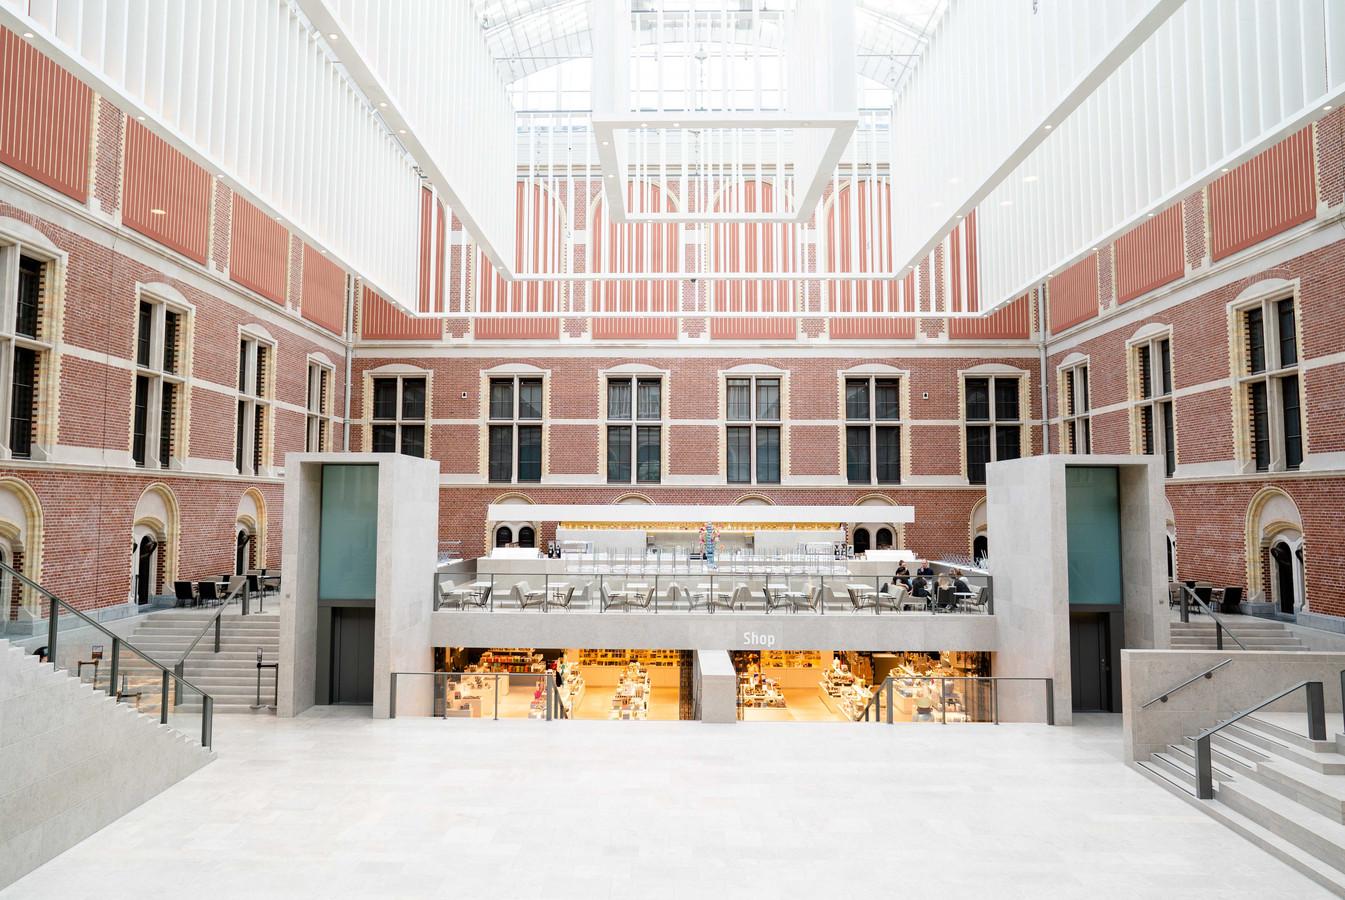 Het Rijksmuseum is nu ook geslote vanwege het coronavirus.